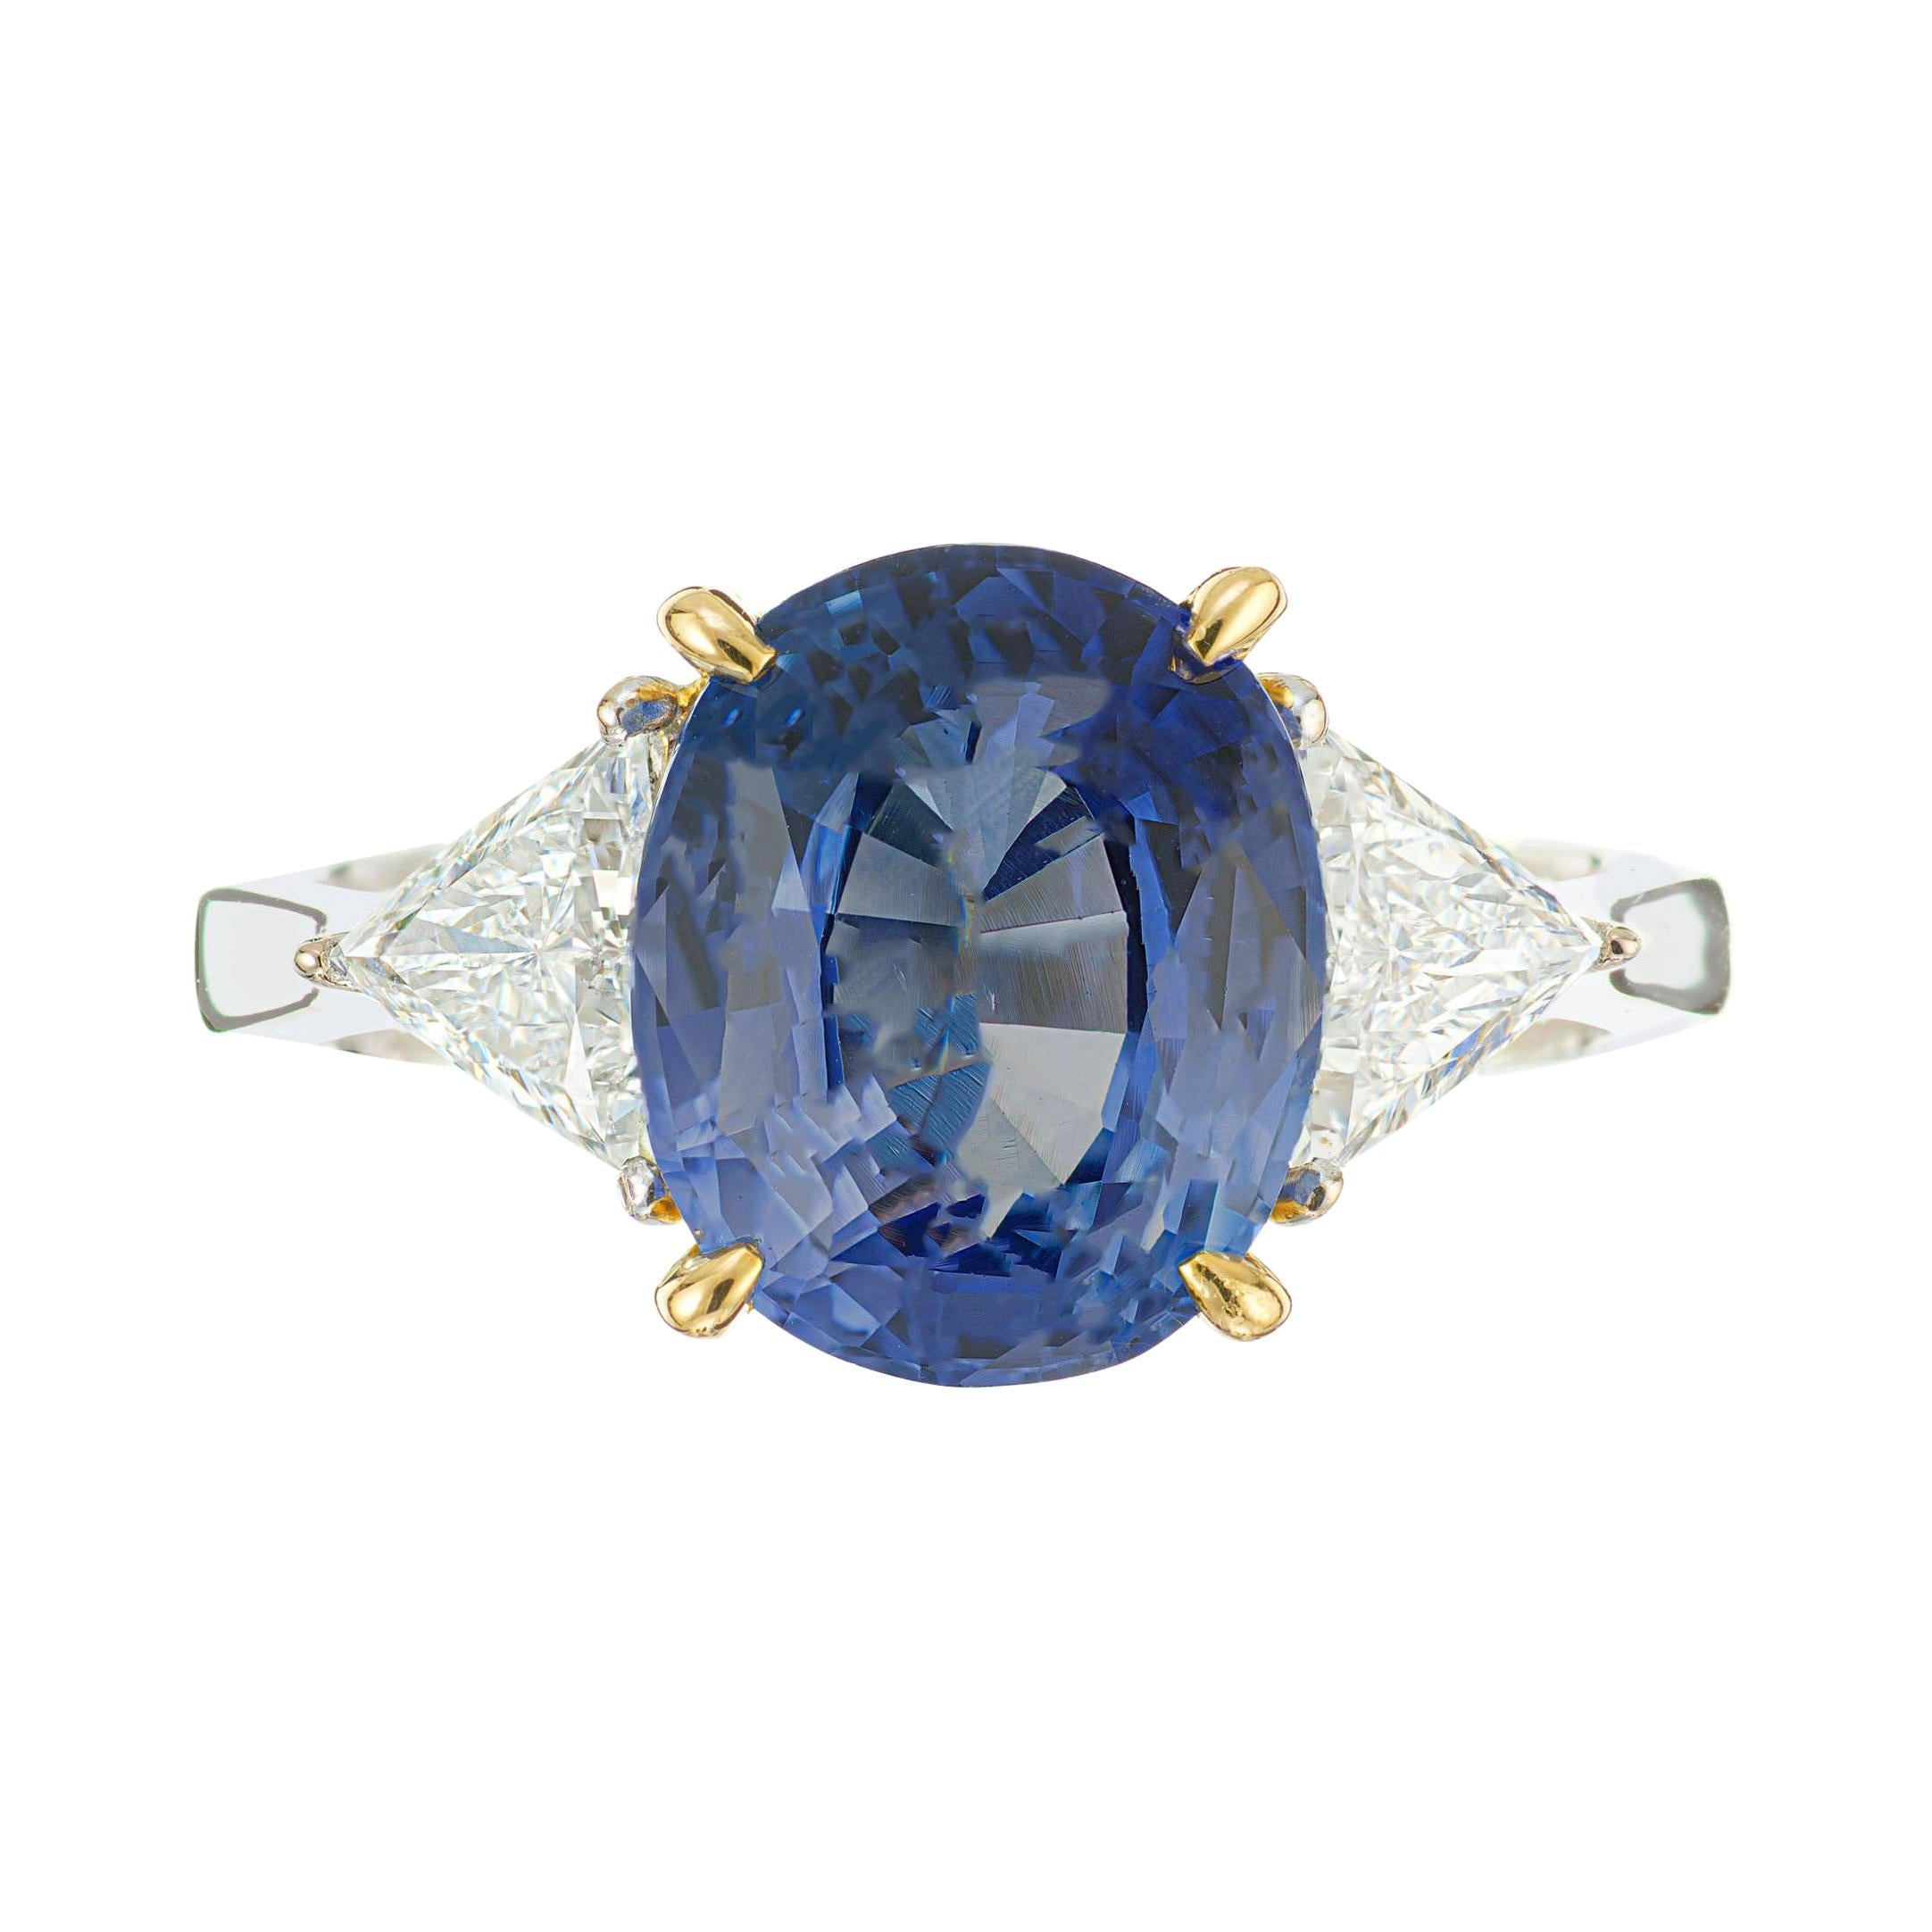 4.50 Carat Cornflower Blue Sapphire Diamond Gold Three-Stone Engagement Ring